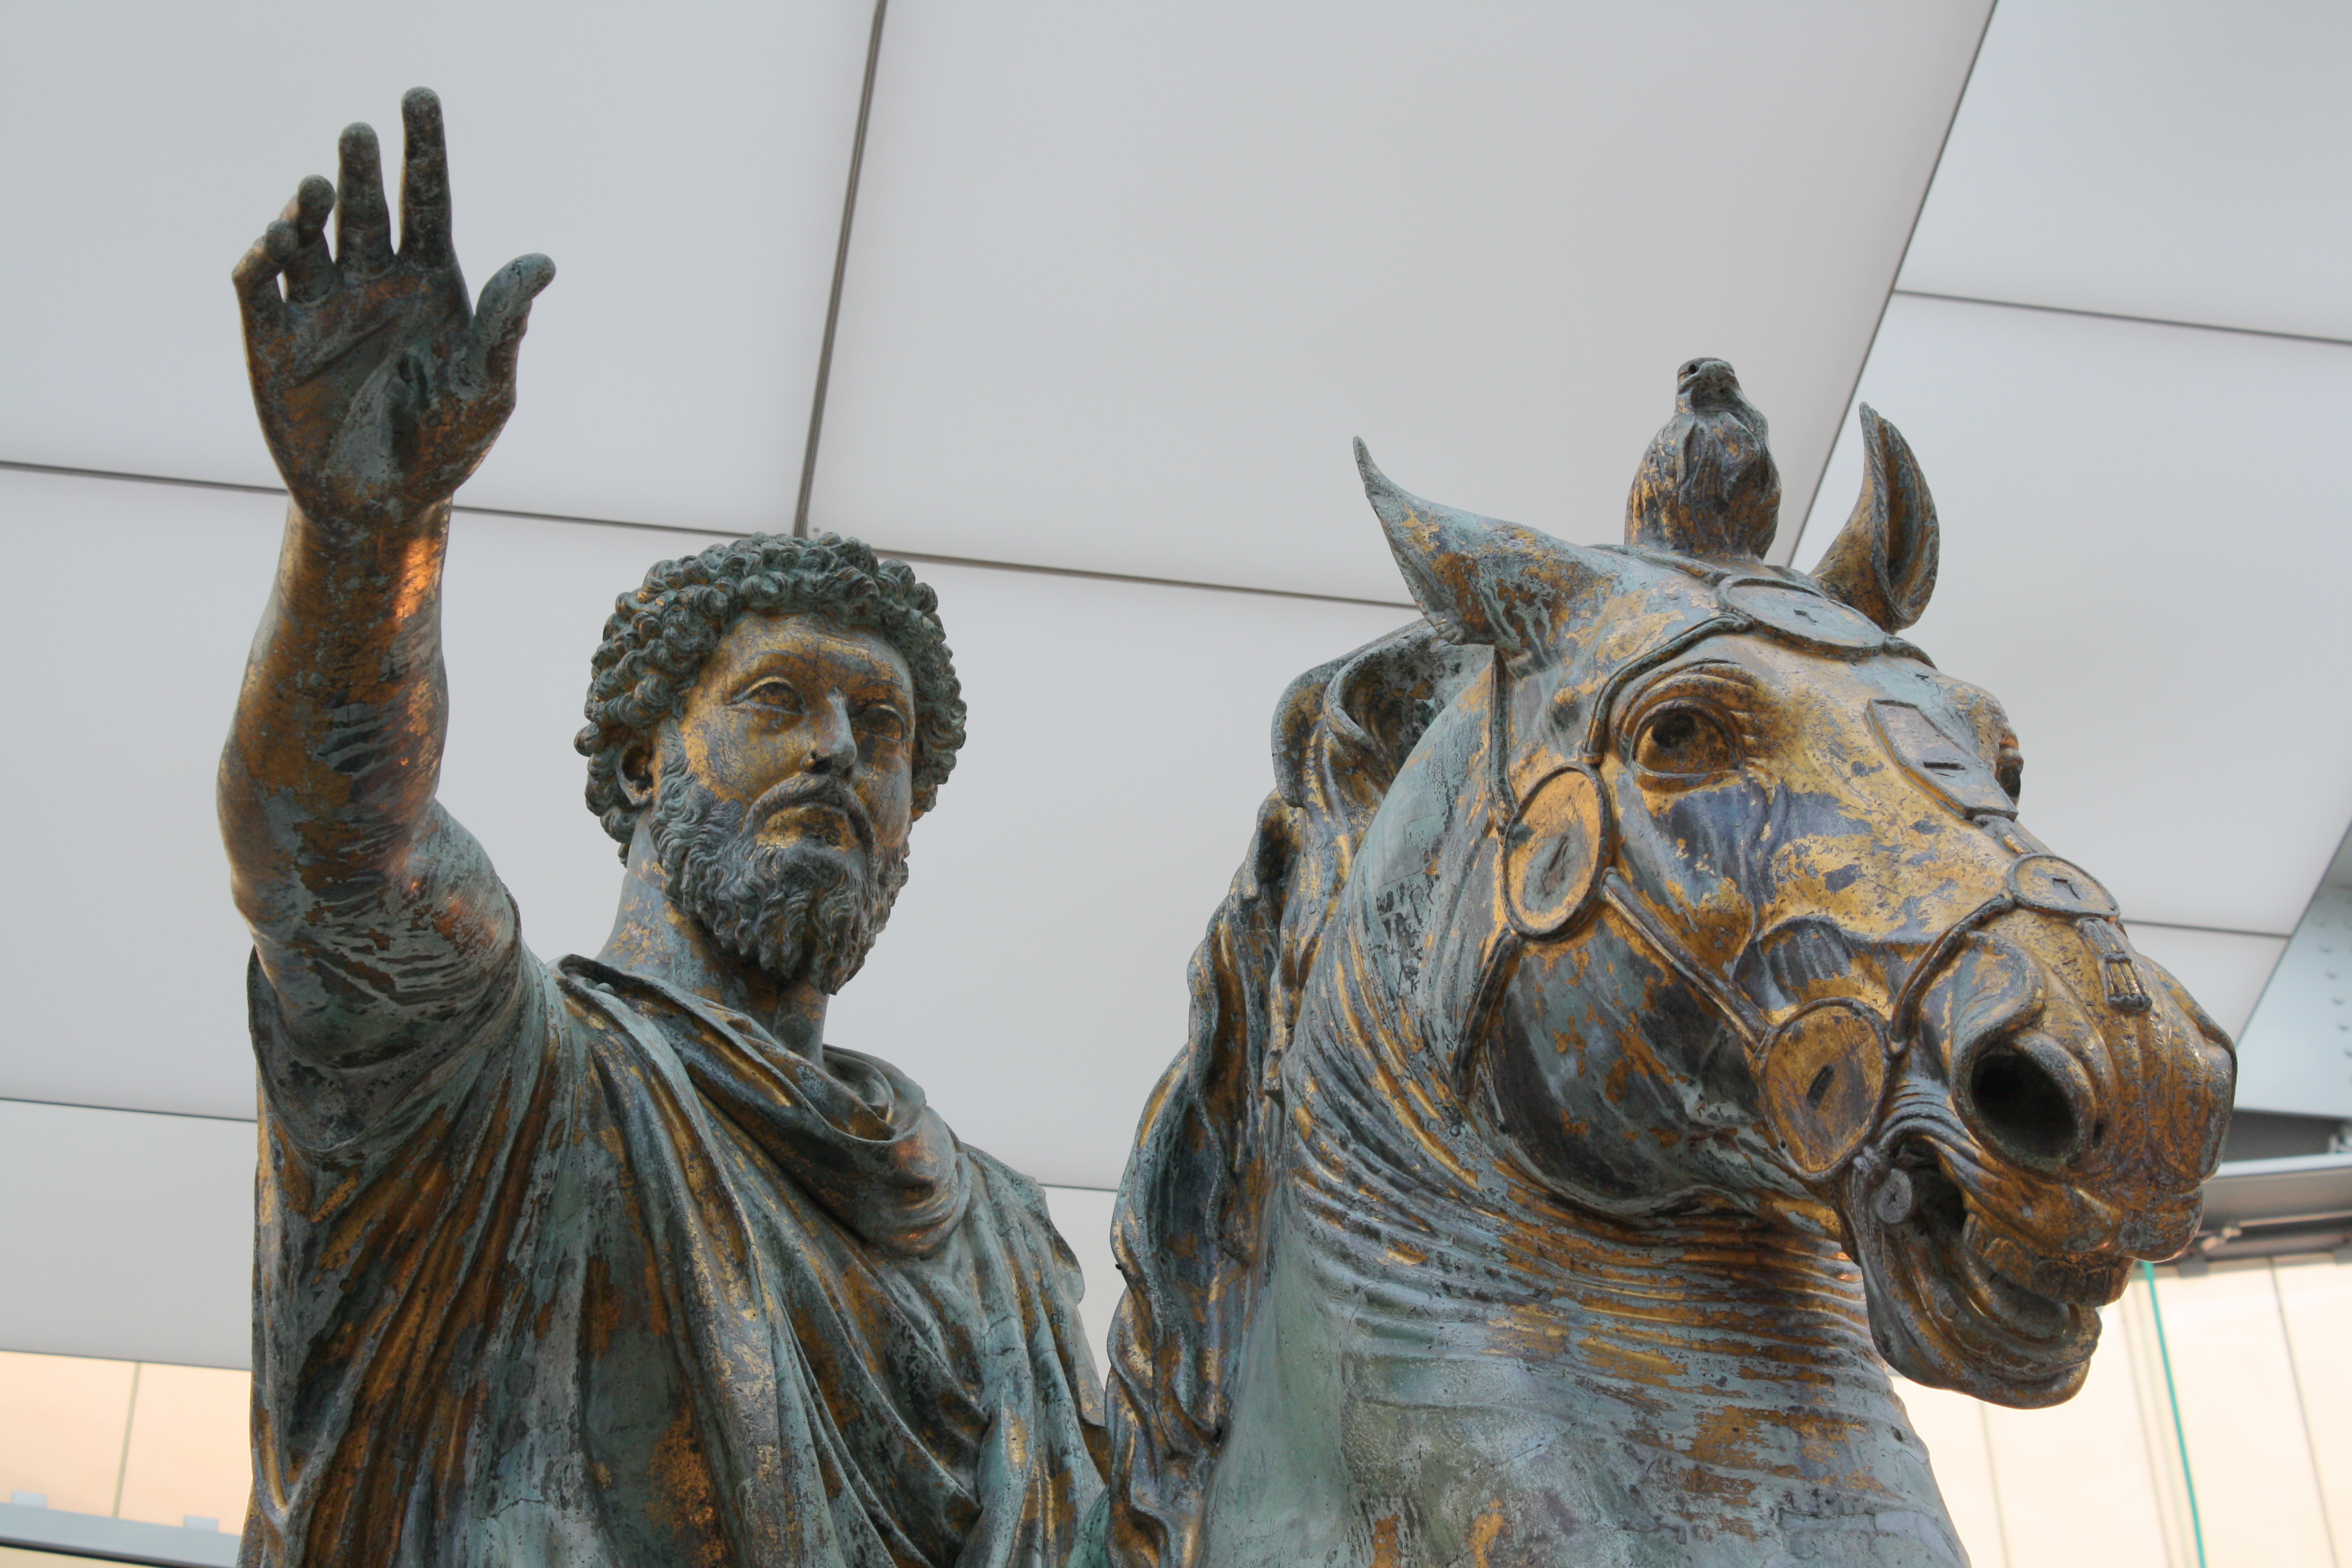 Marcus Aurelius Illustration Ancient History Encyclopedia